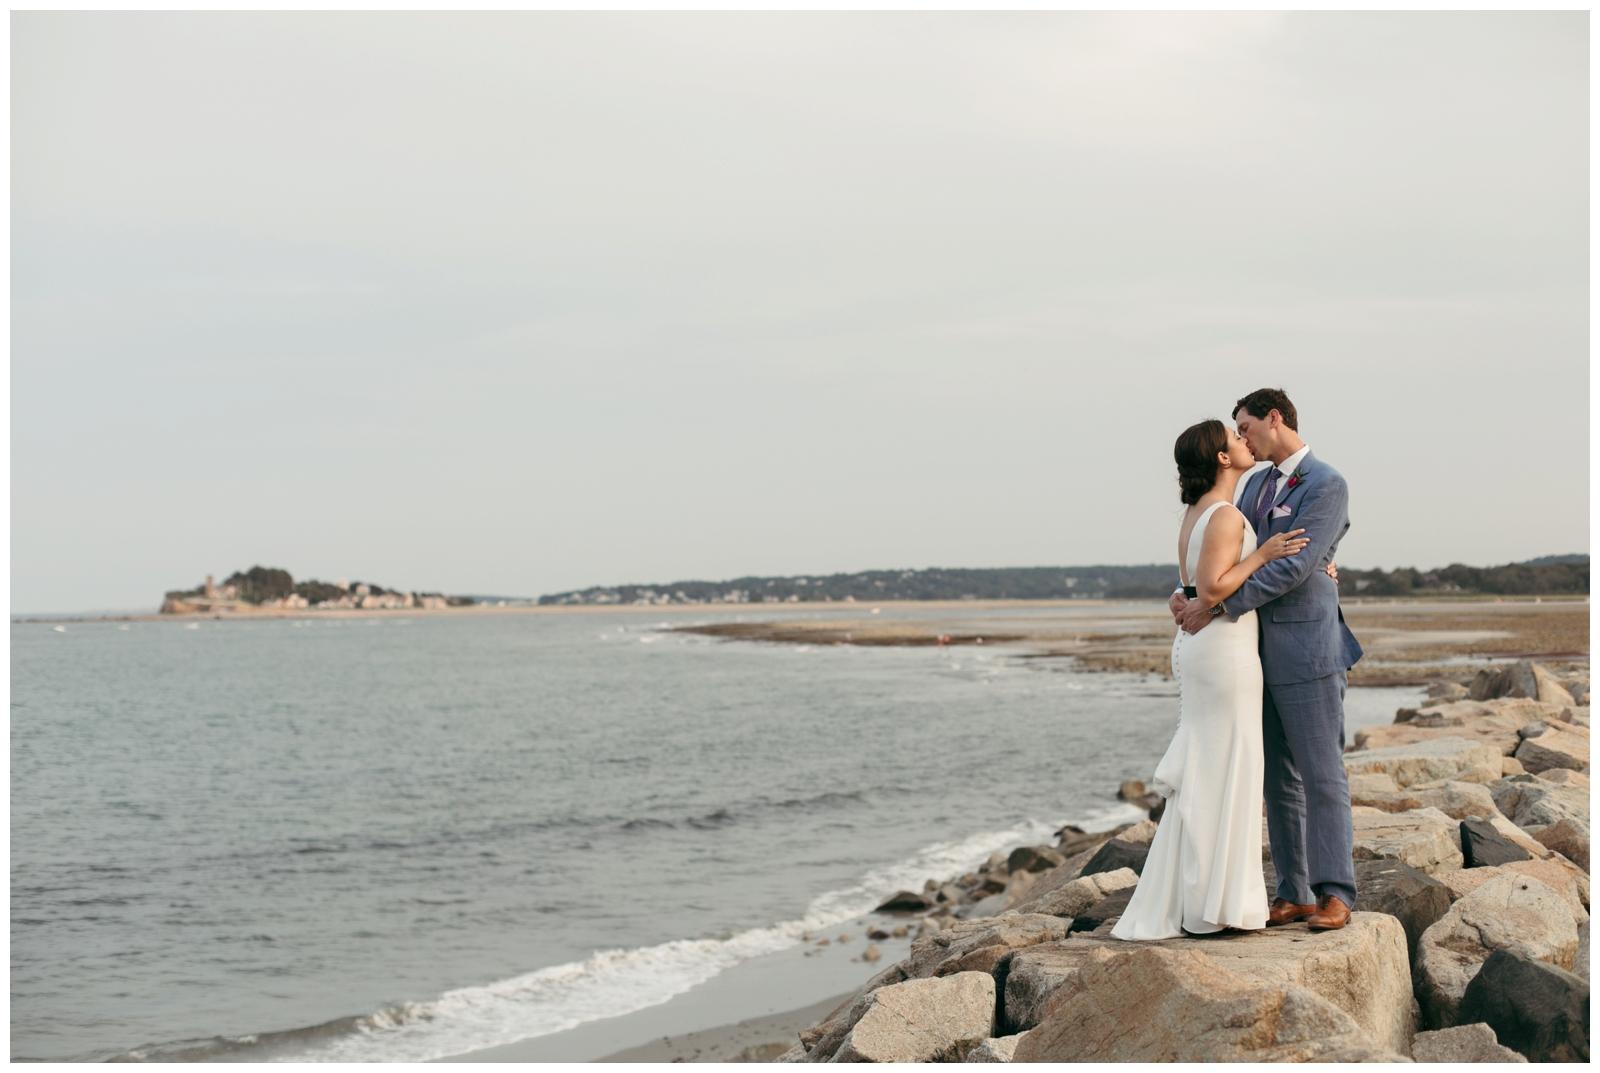 Bailey-Q-Photo-Backyard-Wedding-South-Shore-Boston-Wedding-Photographer-109.jpg